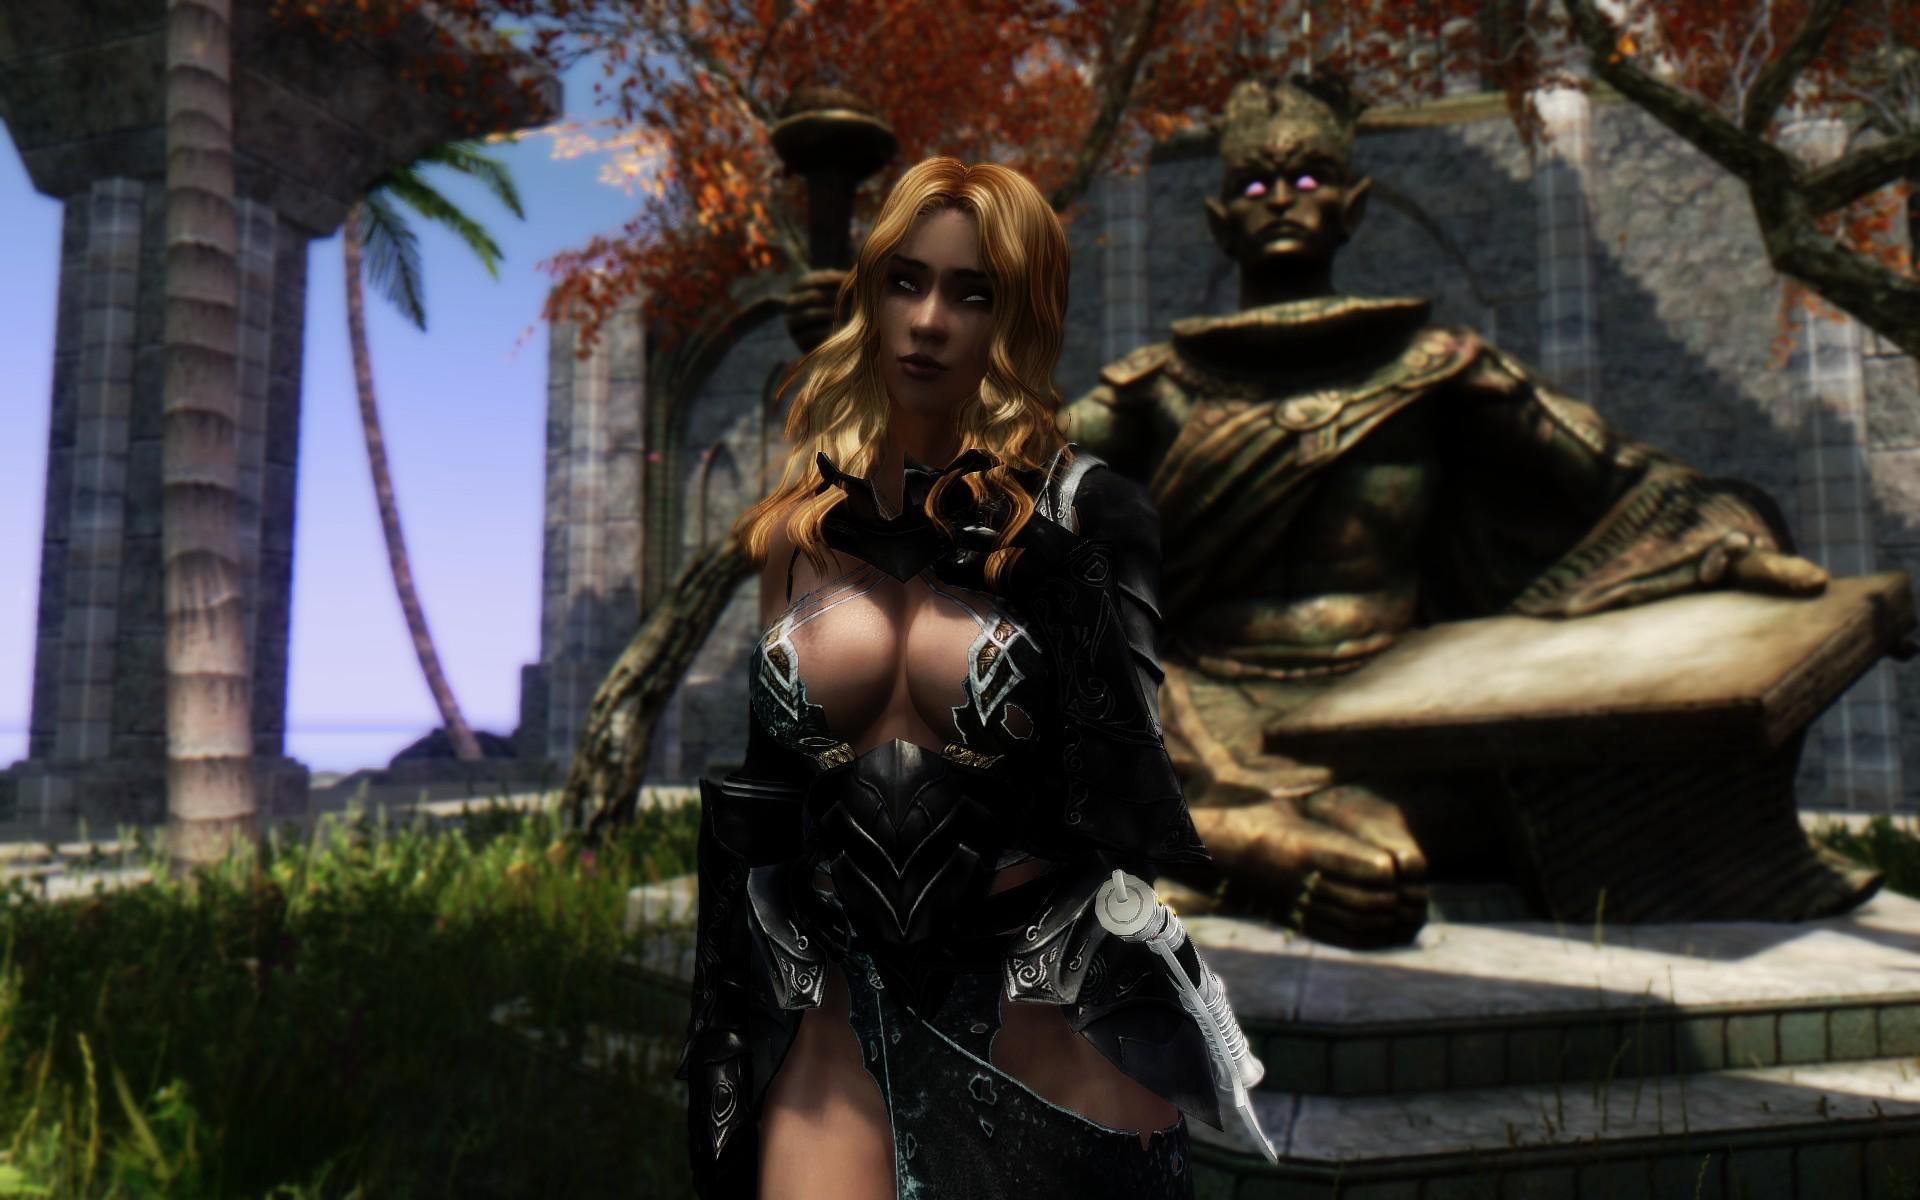 Кстати, ее зовут Ария. )) - Elder Scrolls 5: Skyrim, the